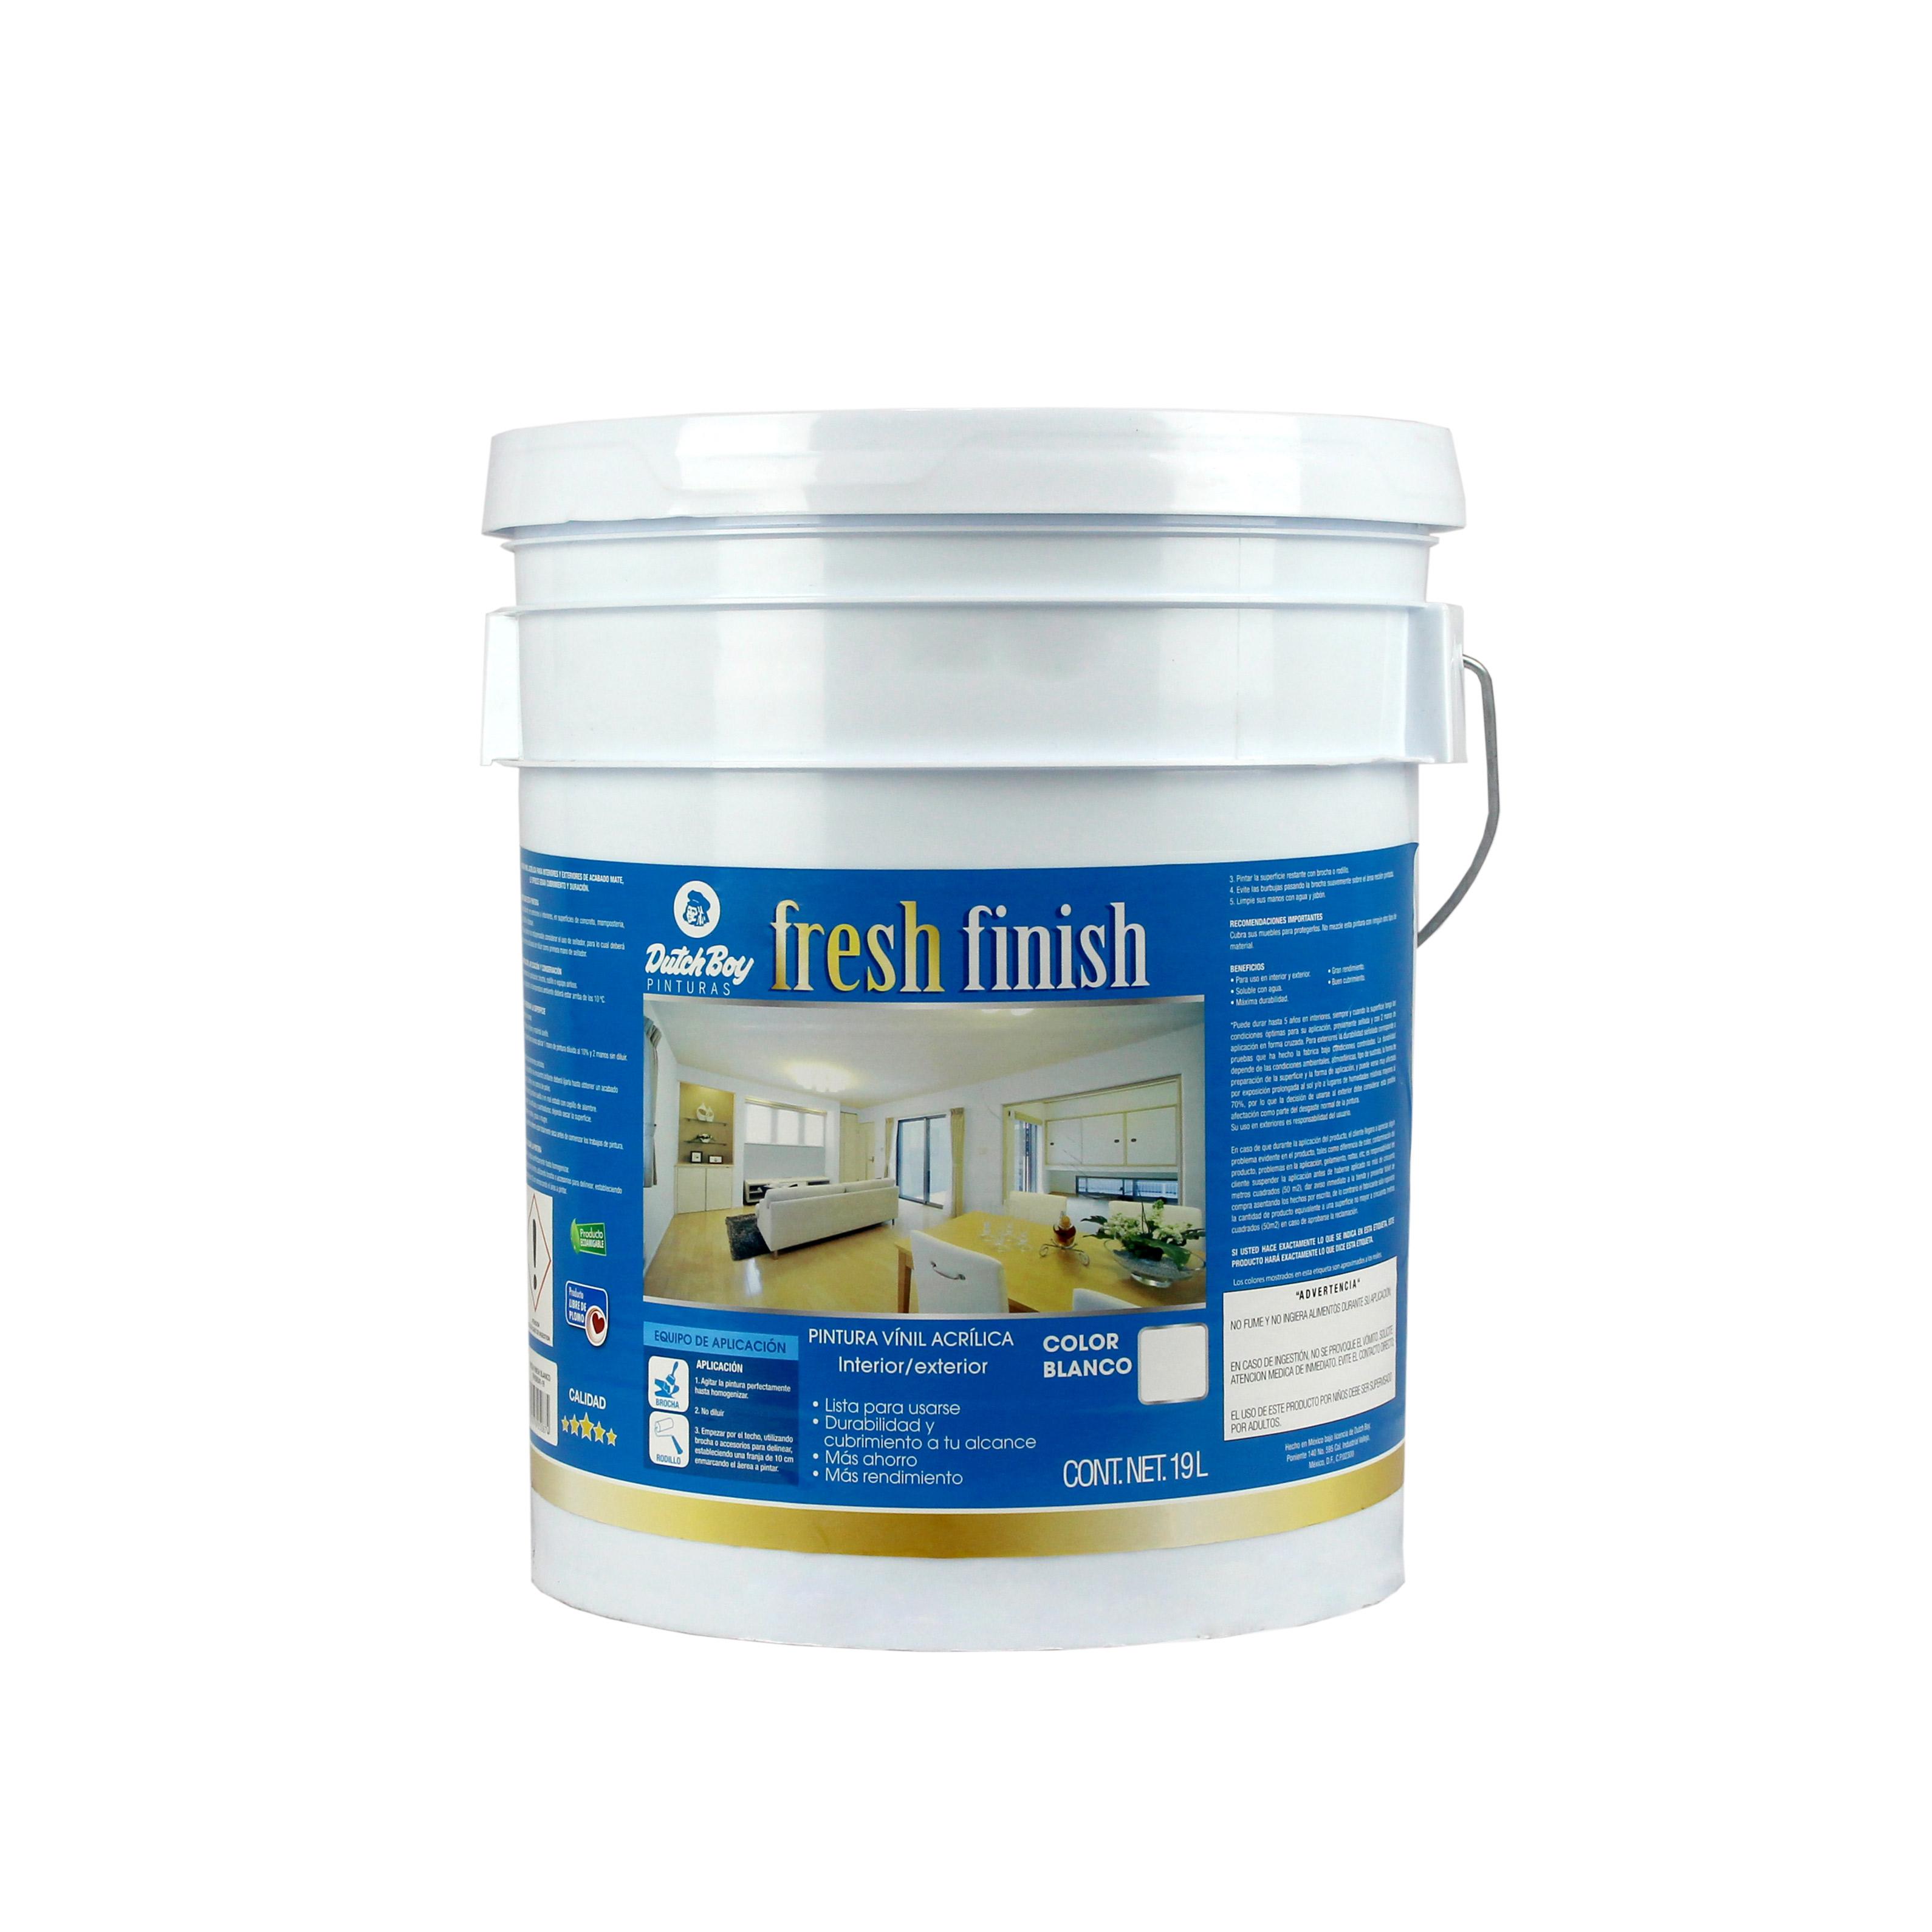 pintura vinil acrílica blanca Fresh Finish dutch boy 19 litros